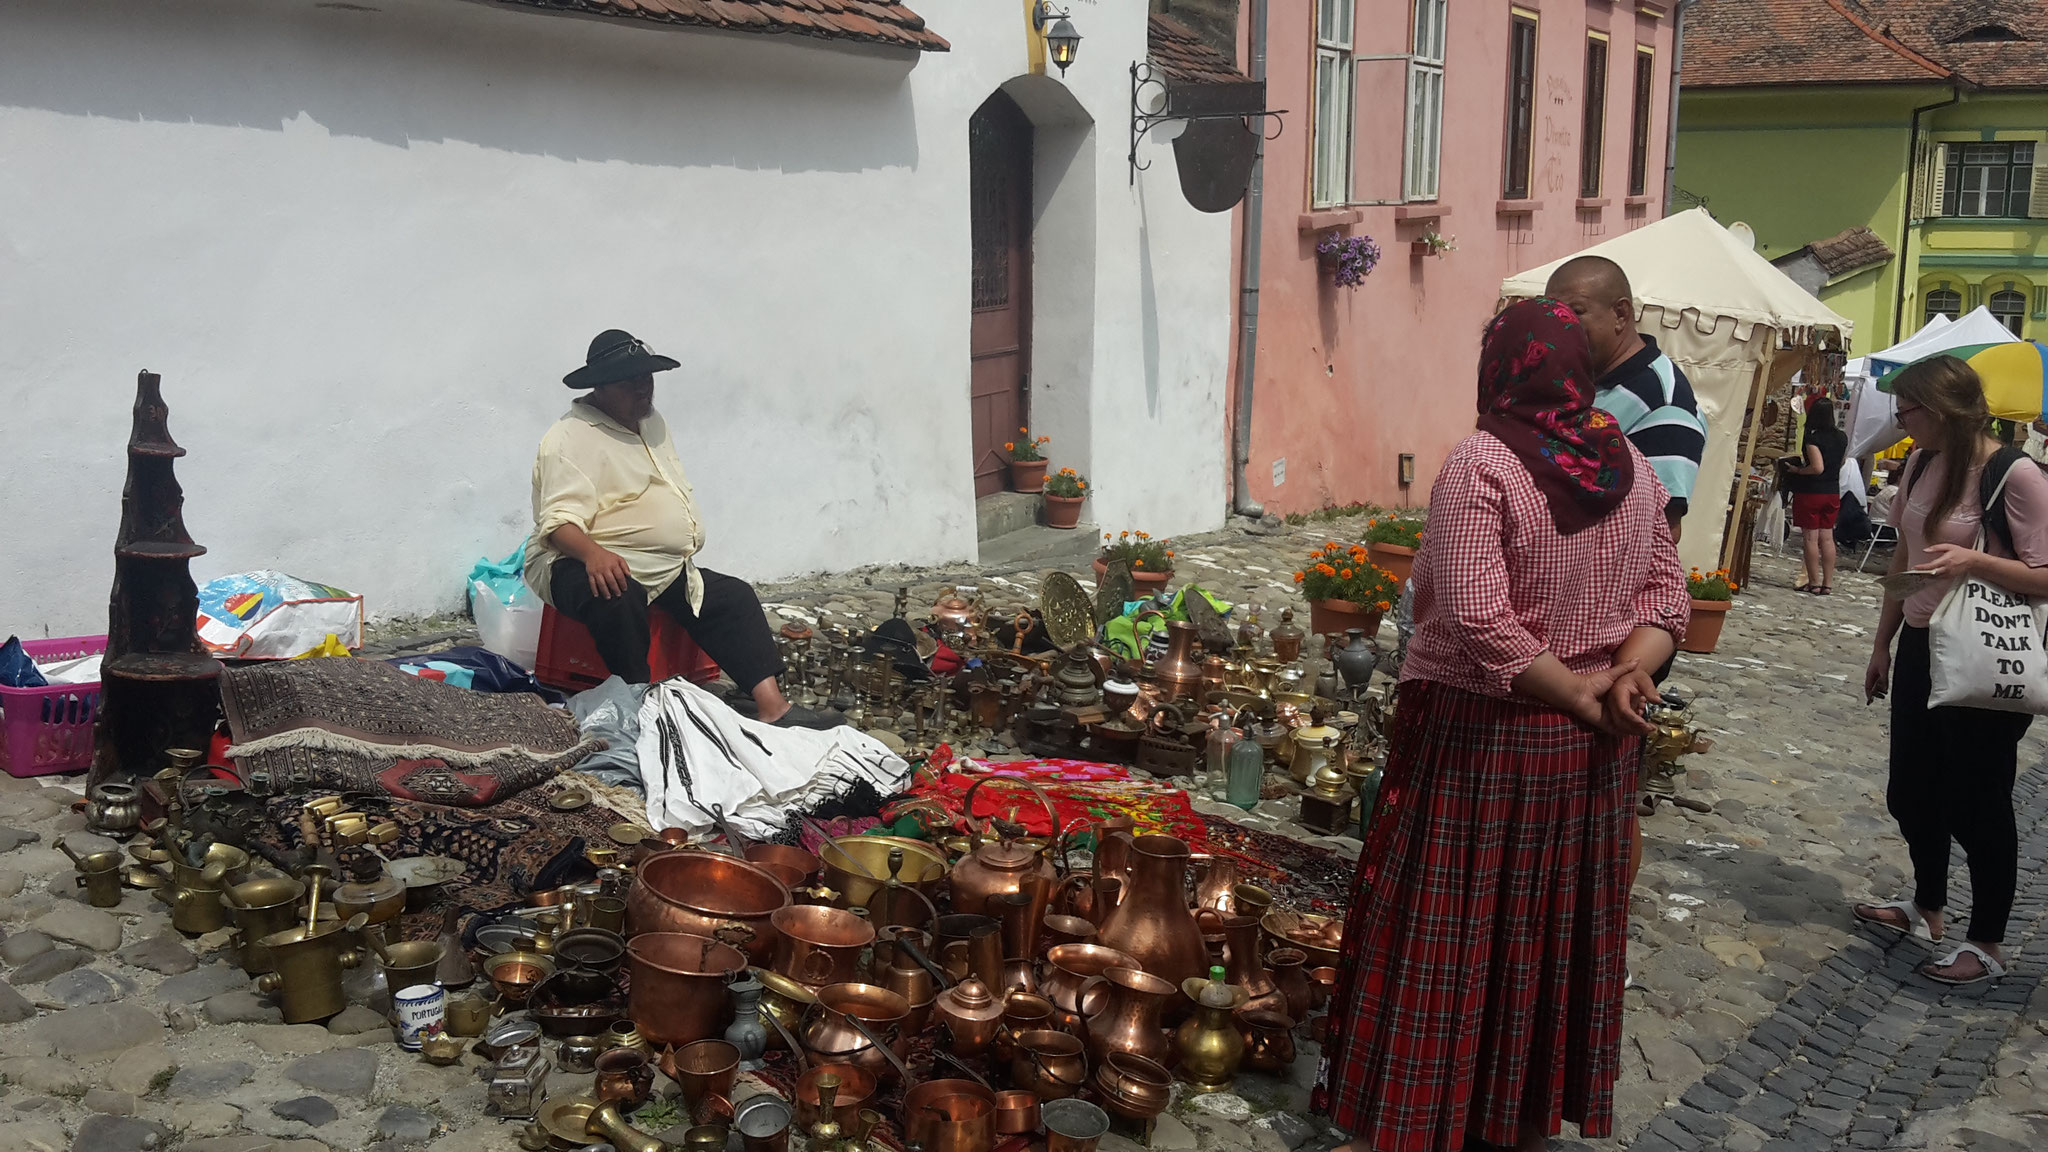 vendedores de la etnia Roma